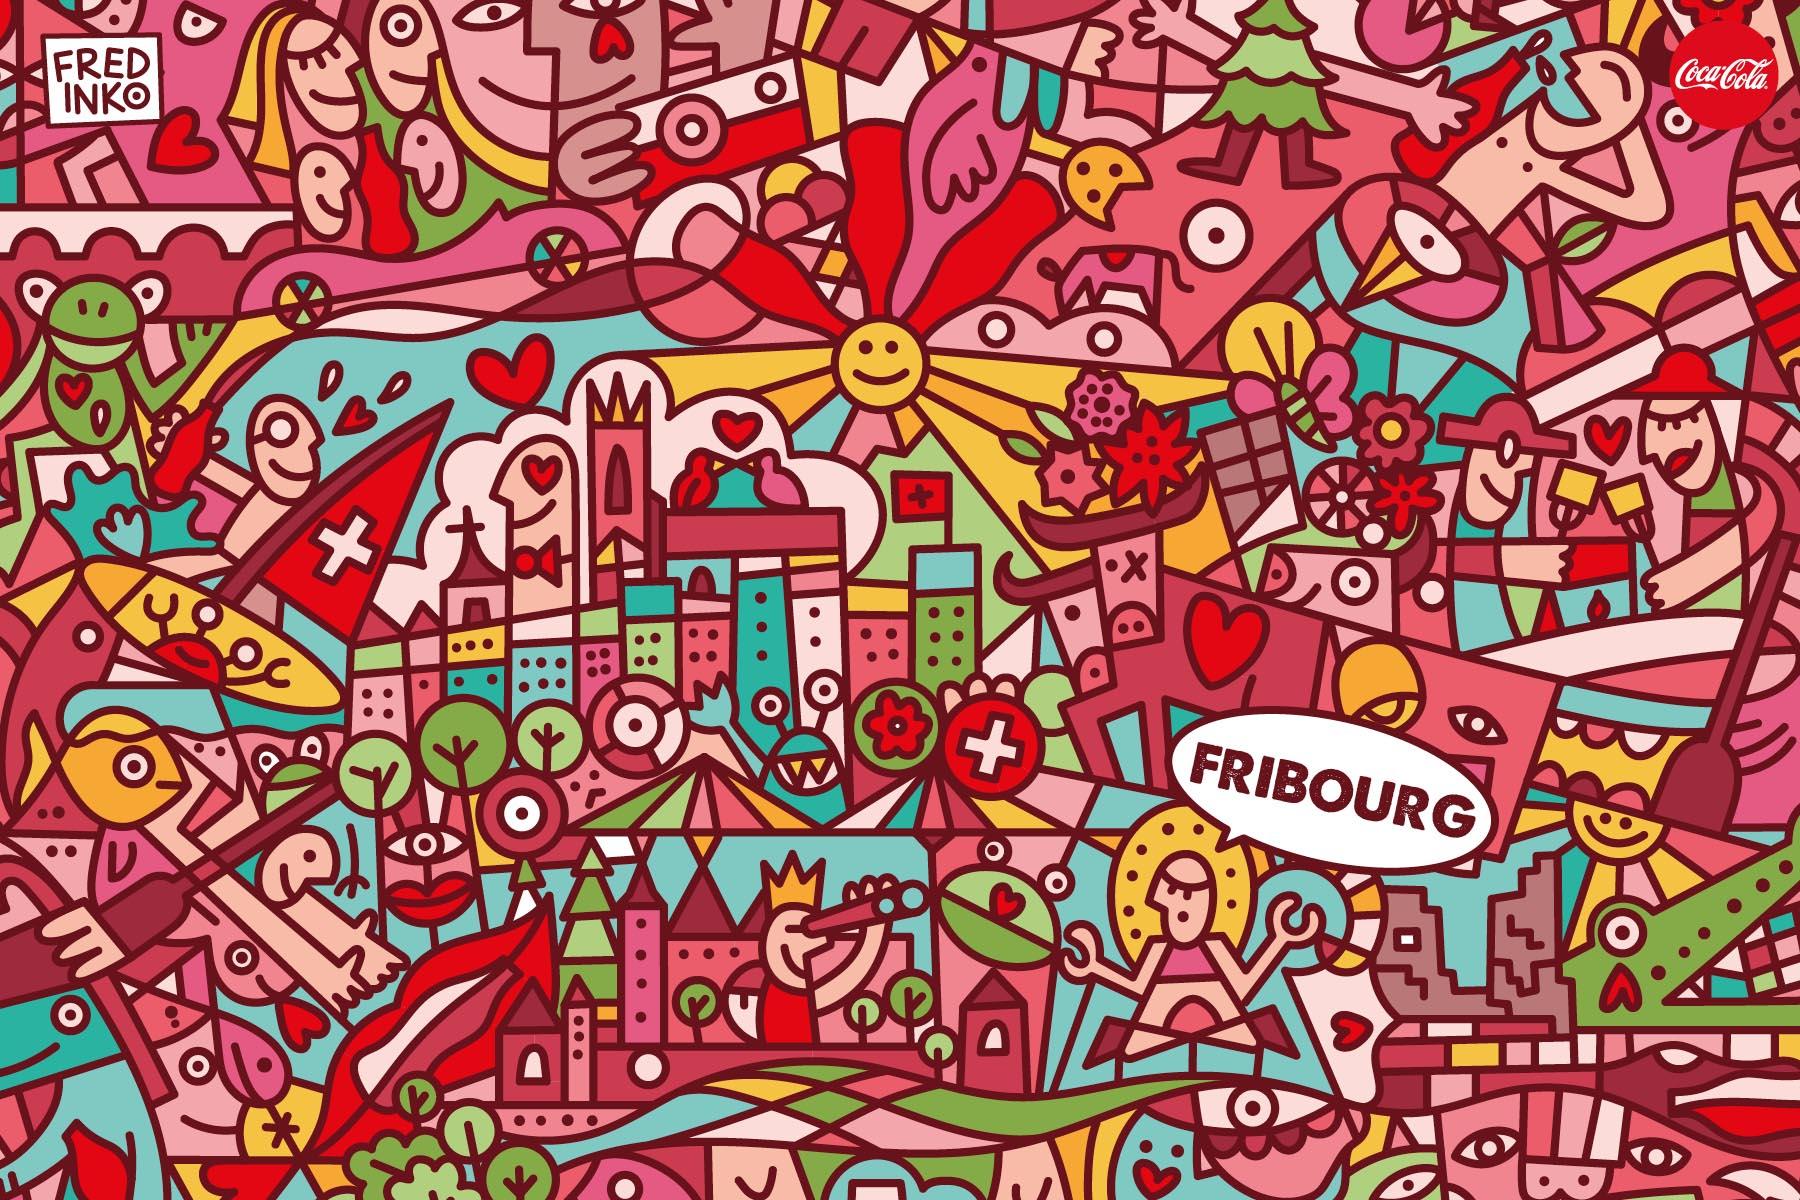 Coke_Fredinko_Doku6.jpg